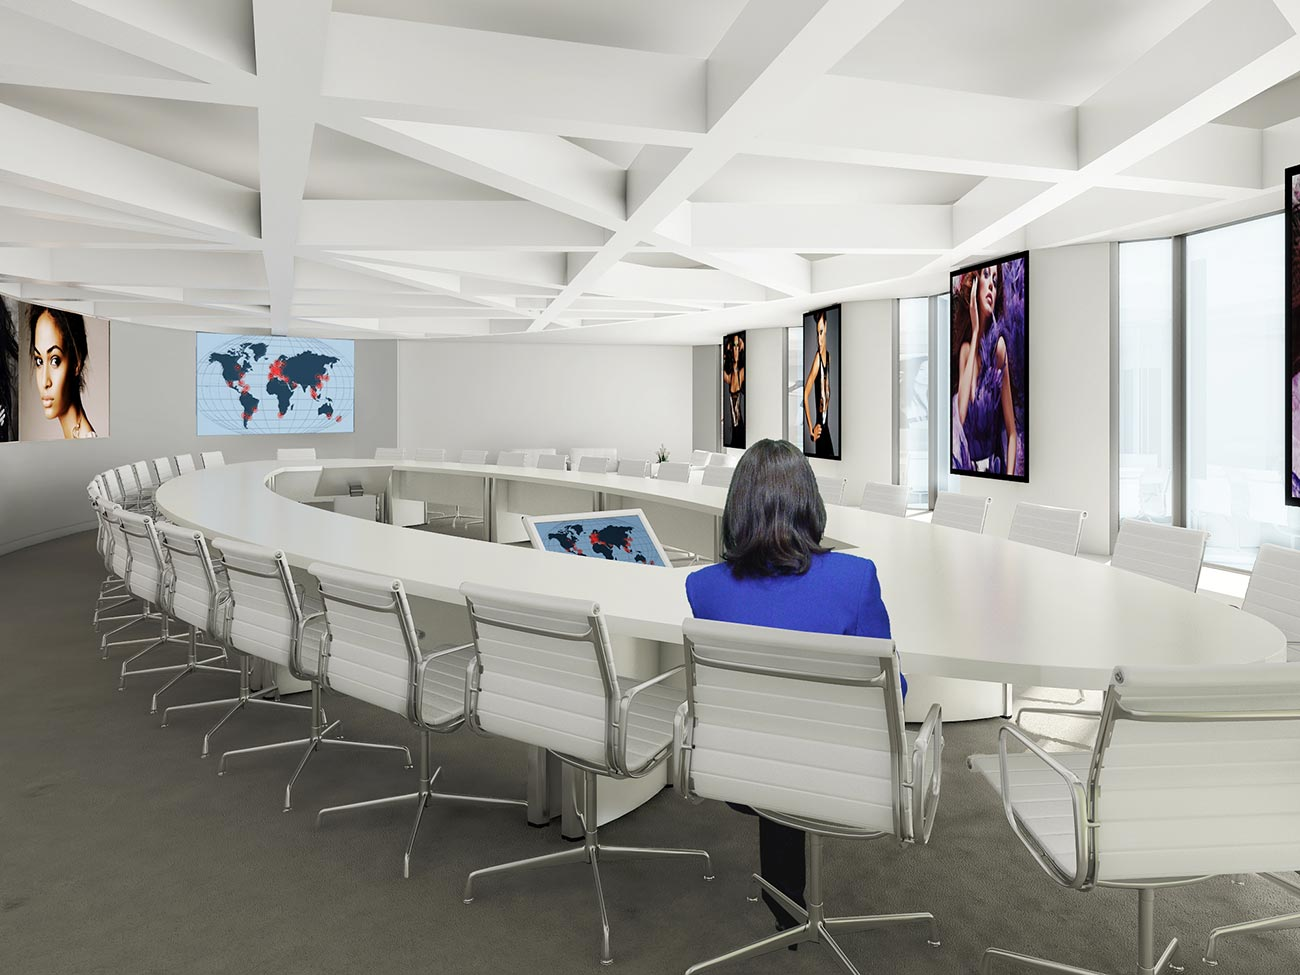 Incroyable Estee Lauder Exec Conference Room